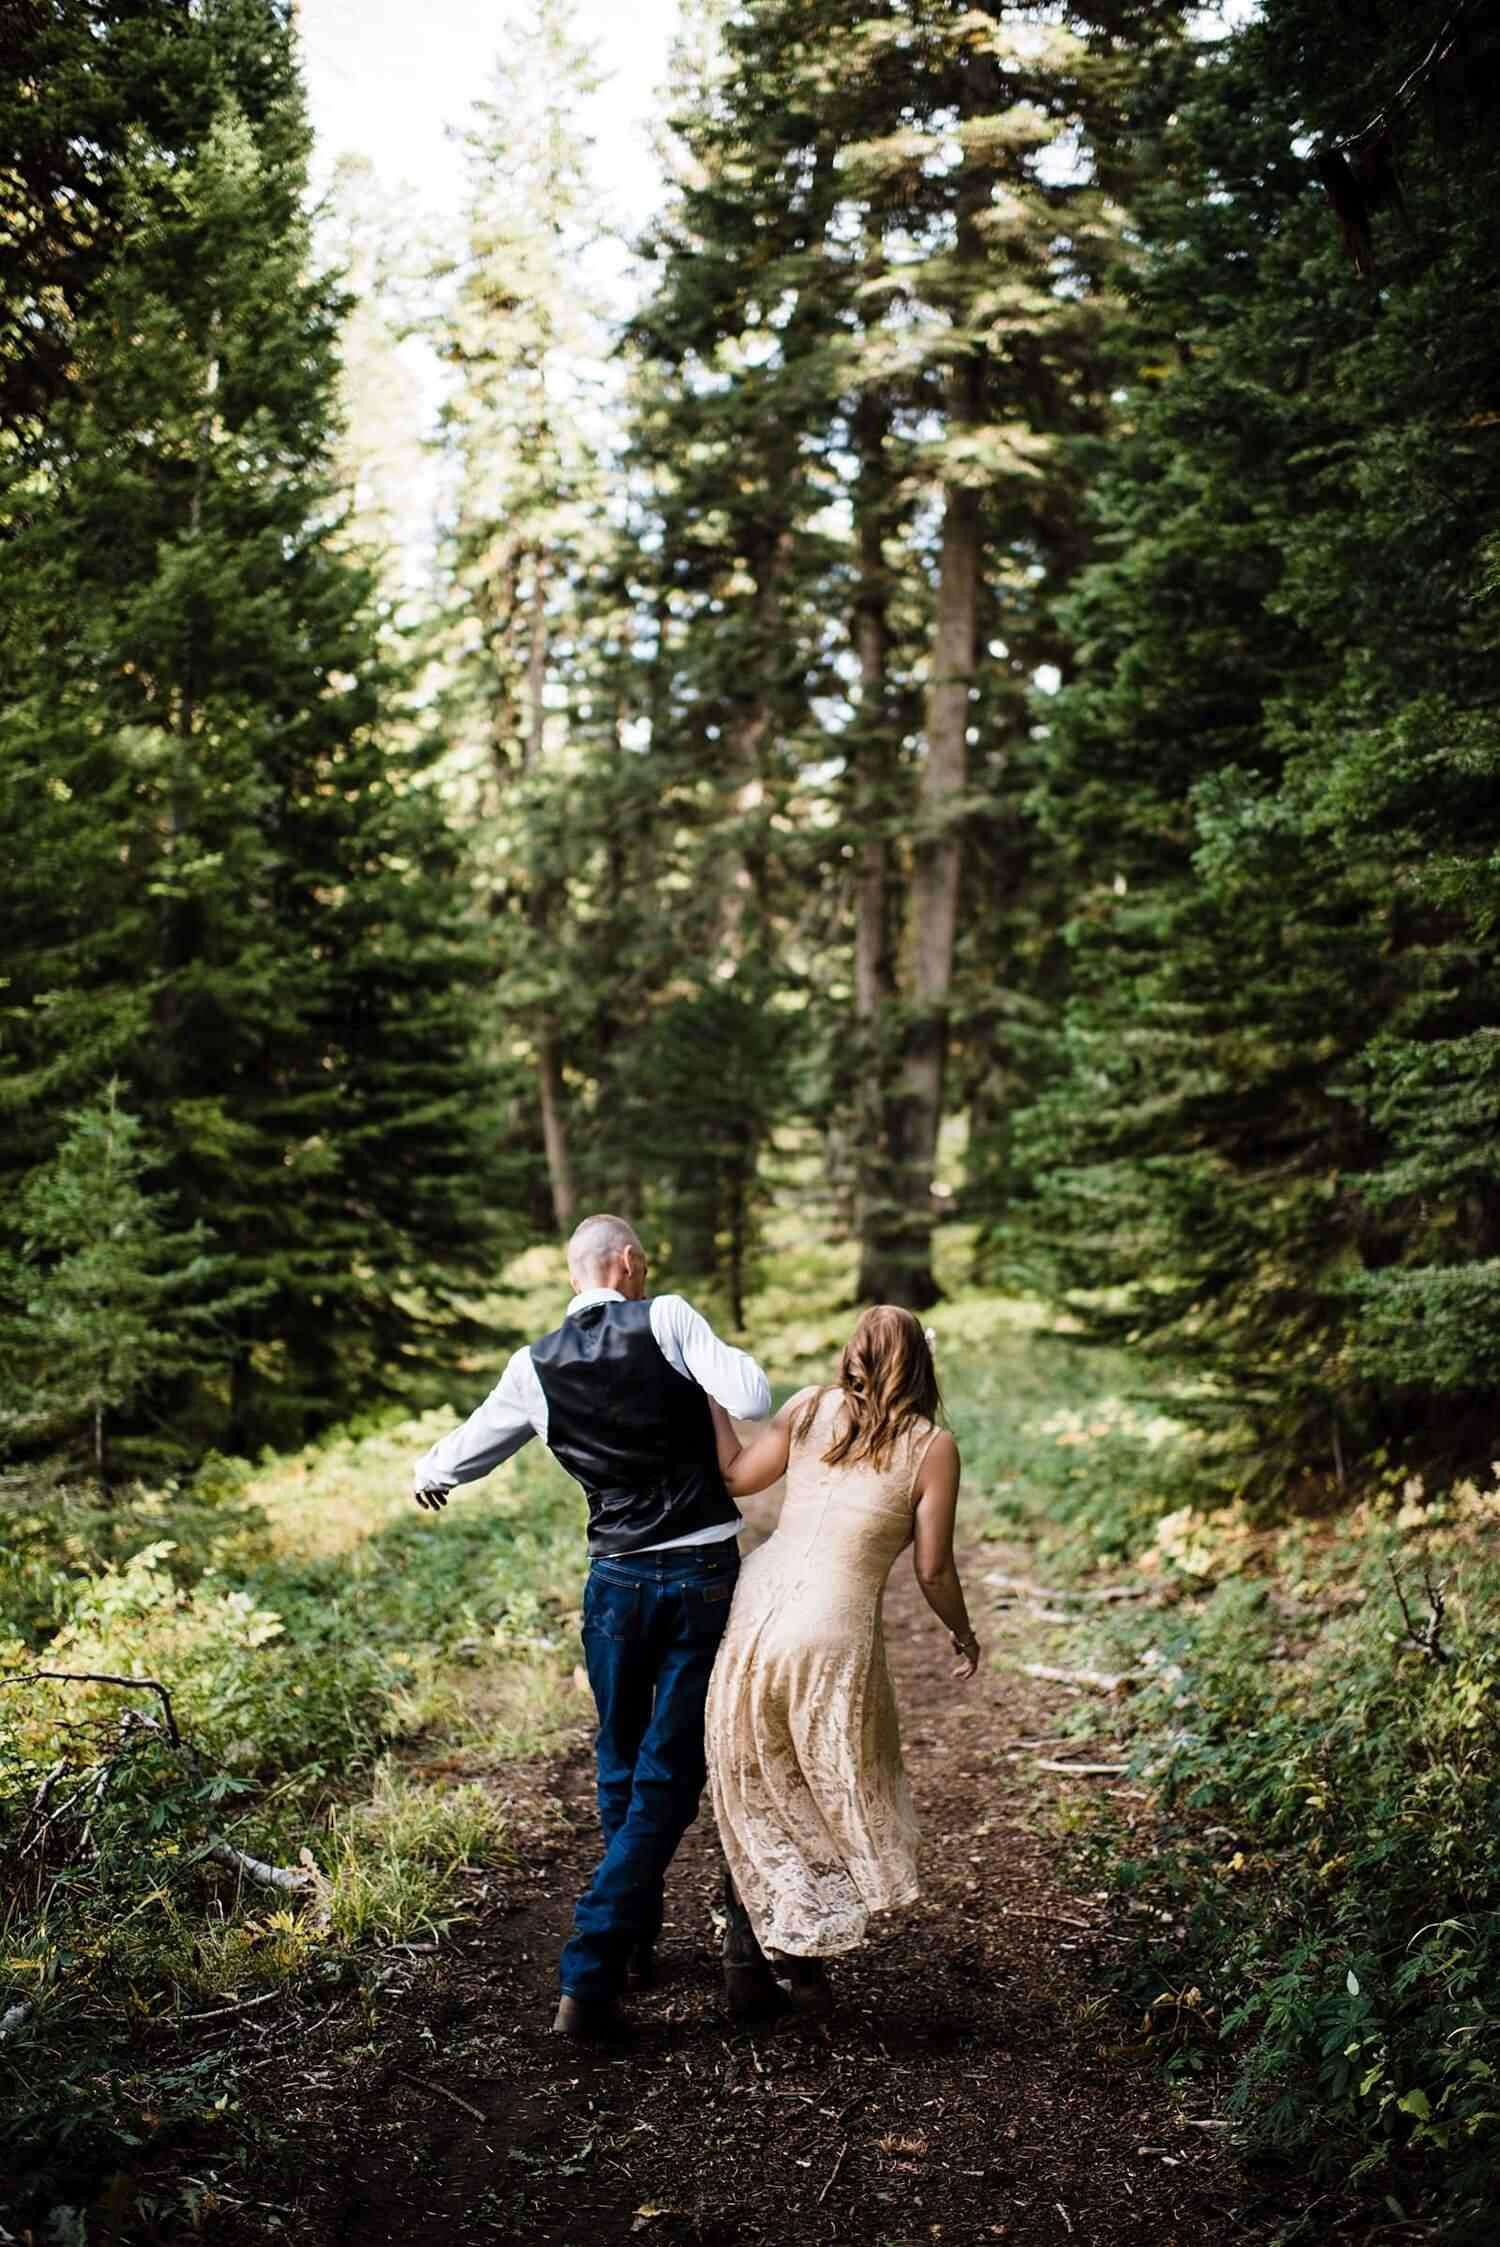 adventure elopement photographer,elopement,ghost town elopement,ghost town wedding,ochoco mountains,oregon elopement,pacific northwest,prineville wedding,sam starns,western elopement,